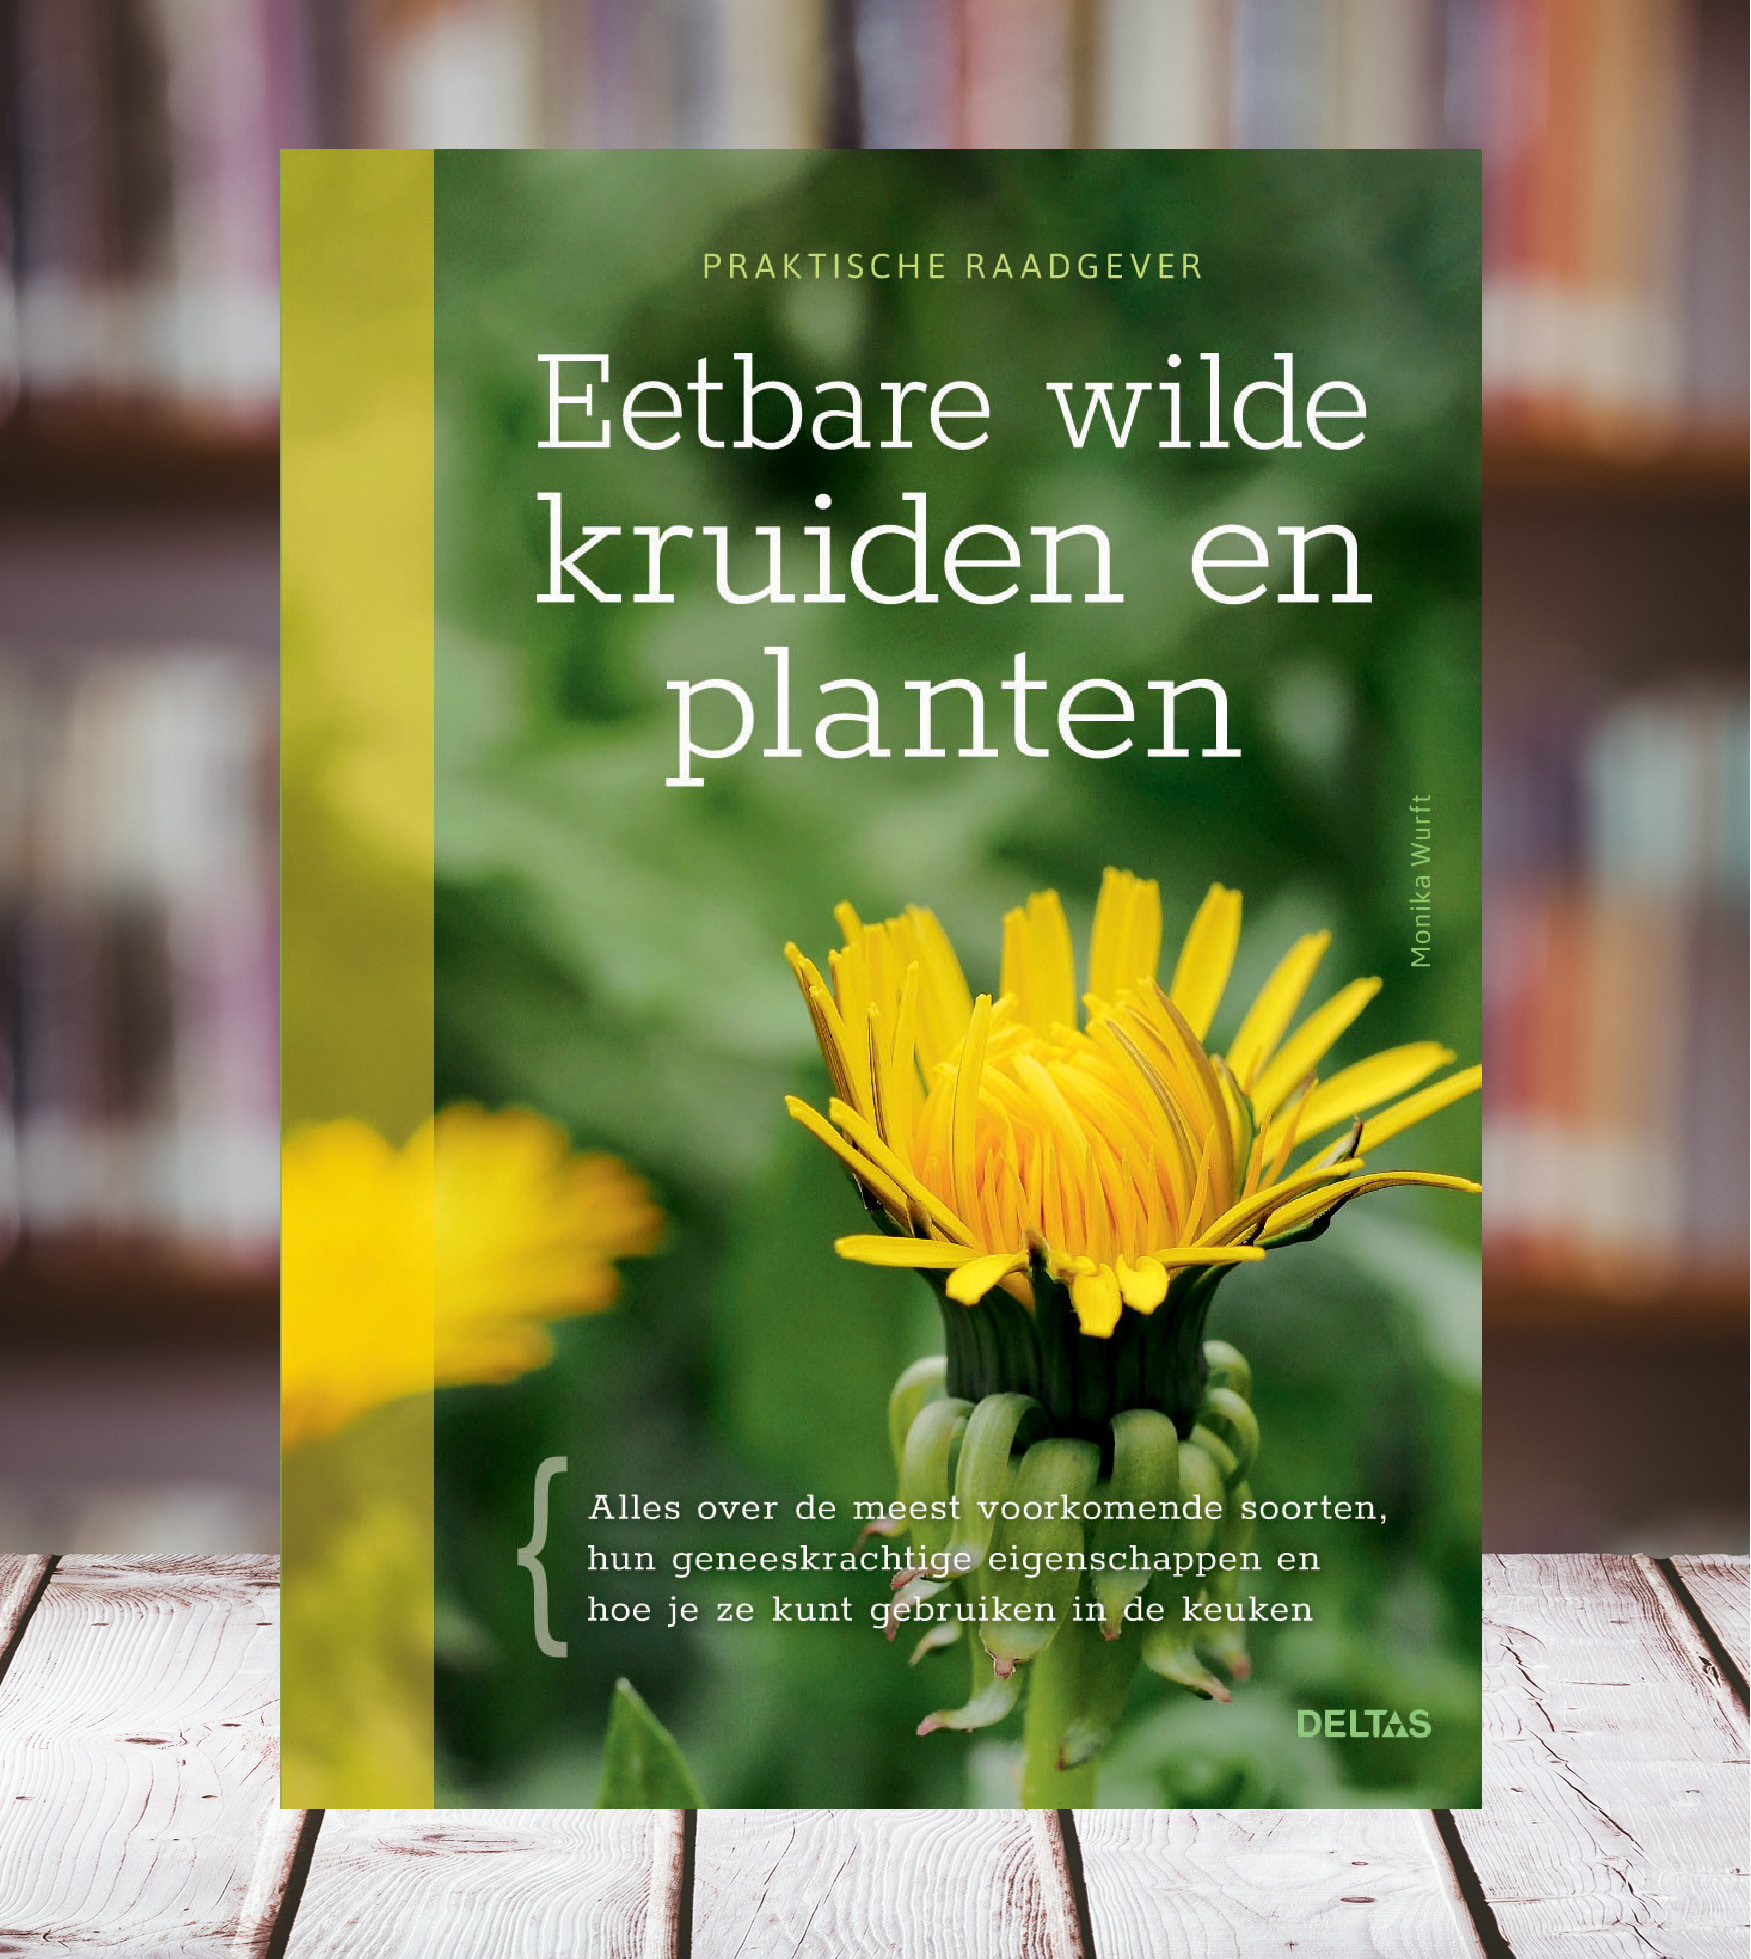 Photo of Eetbare wilde kruiden en planten